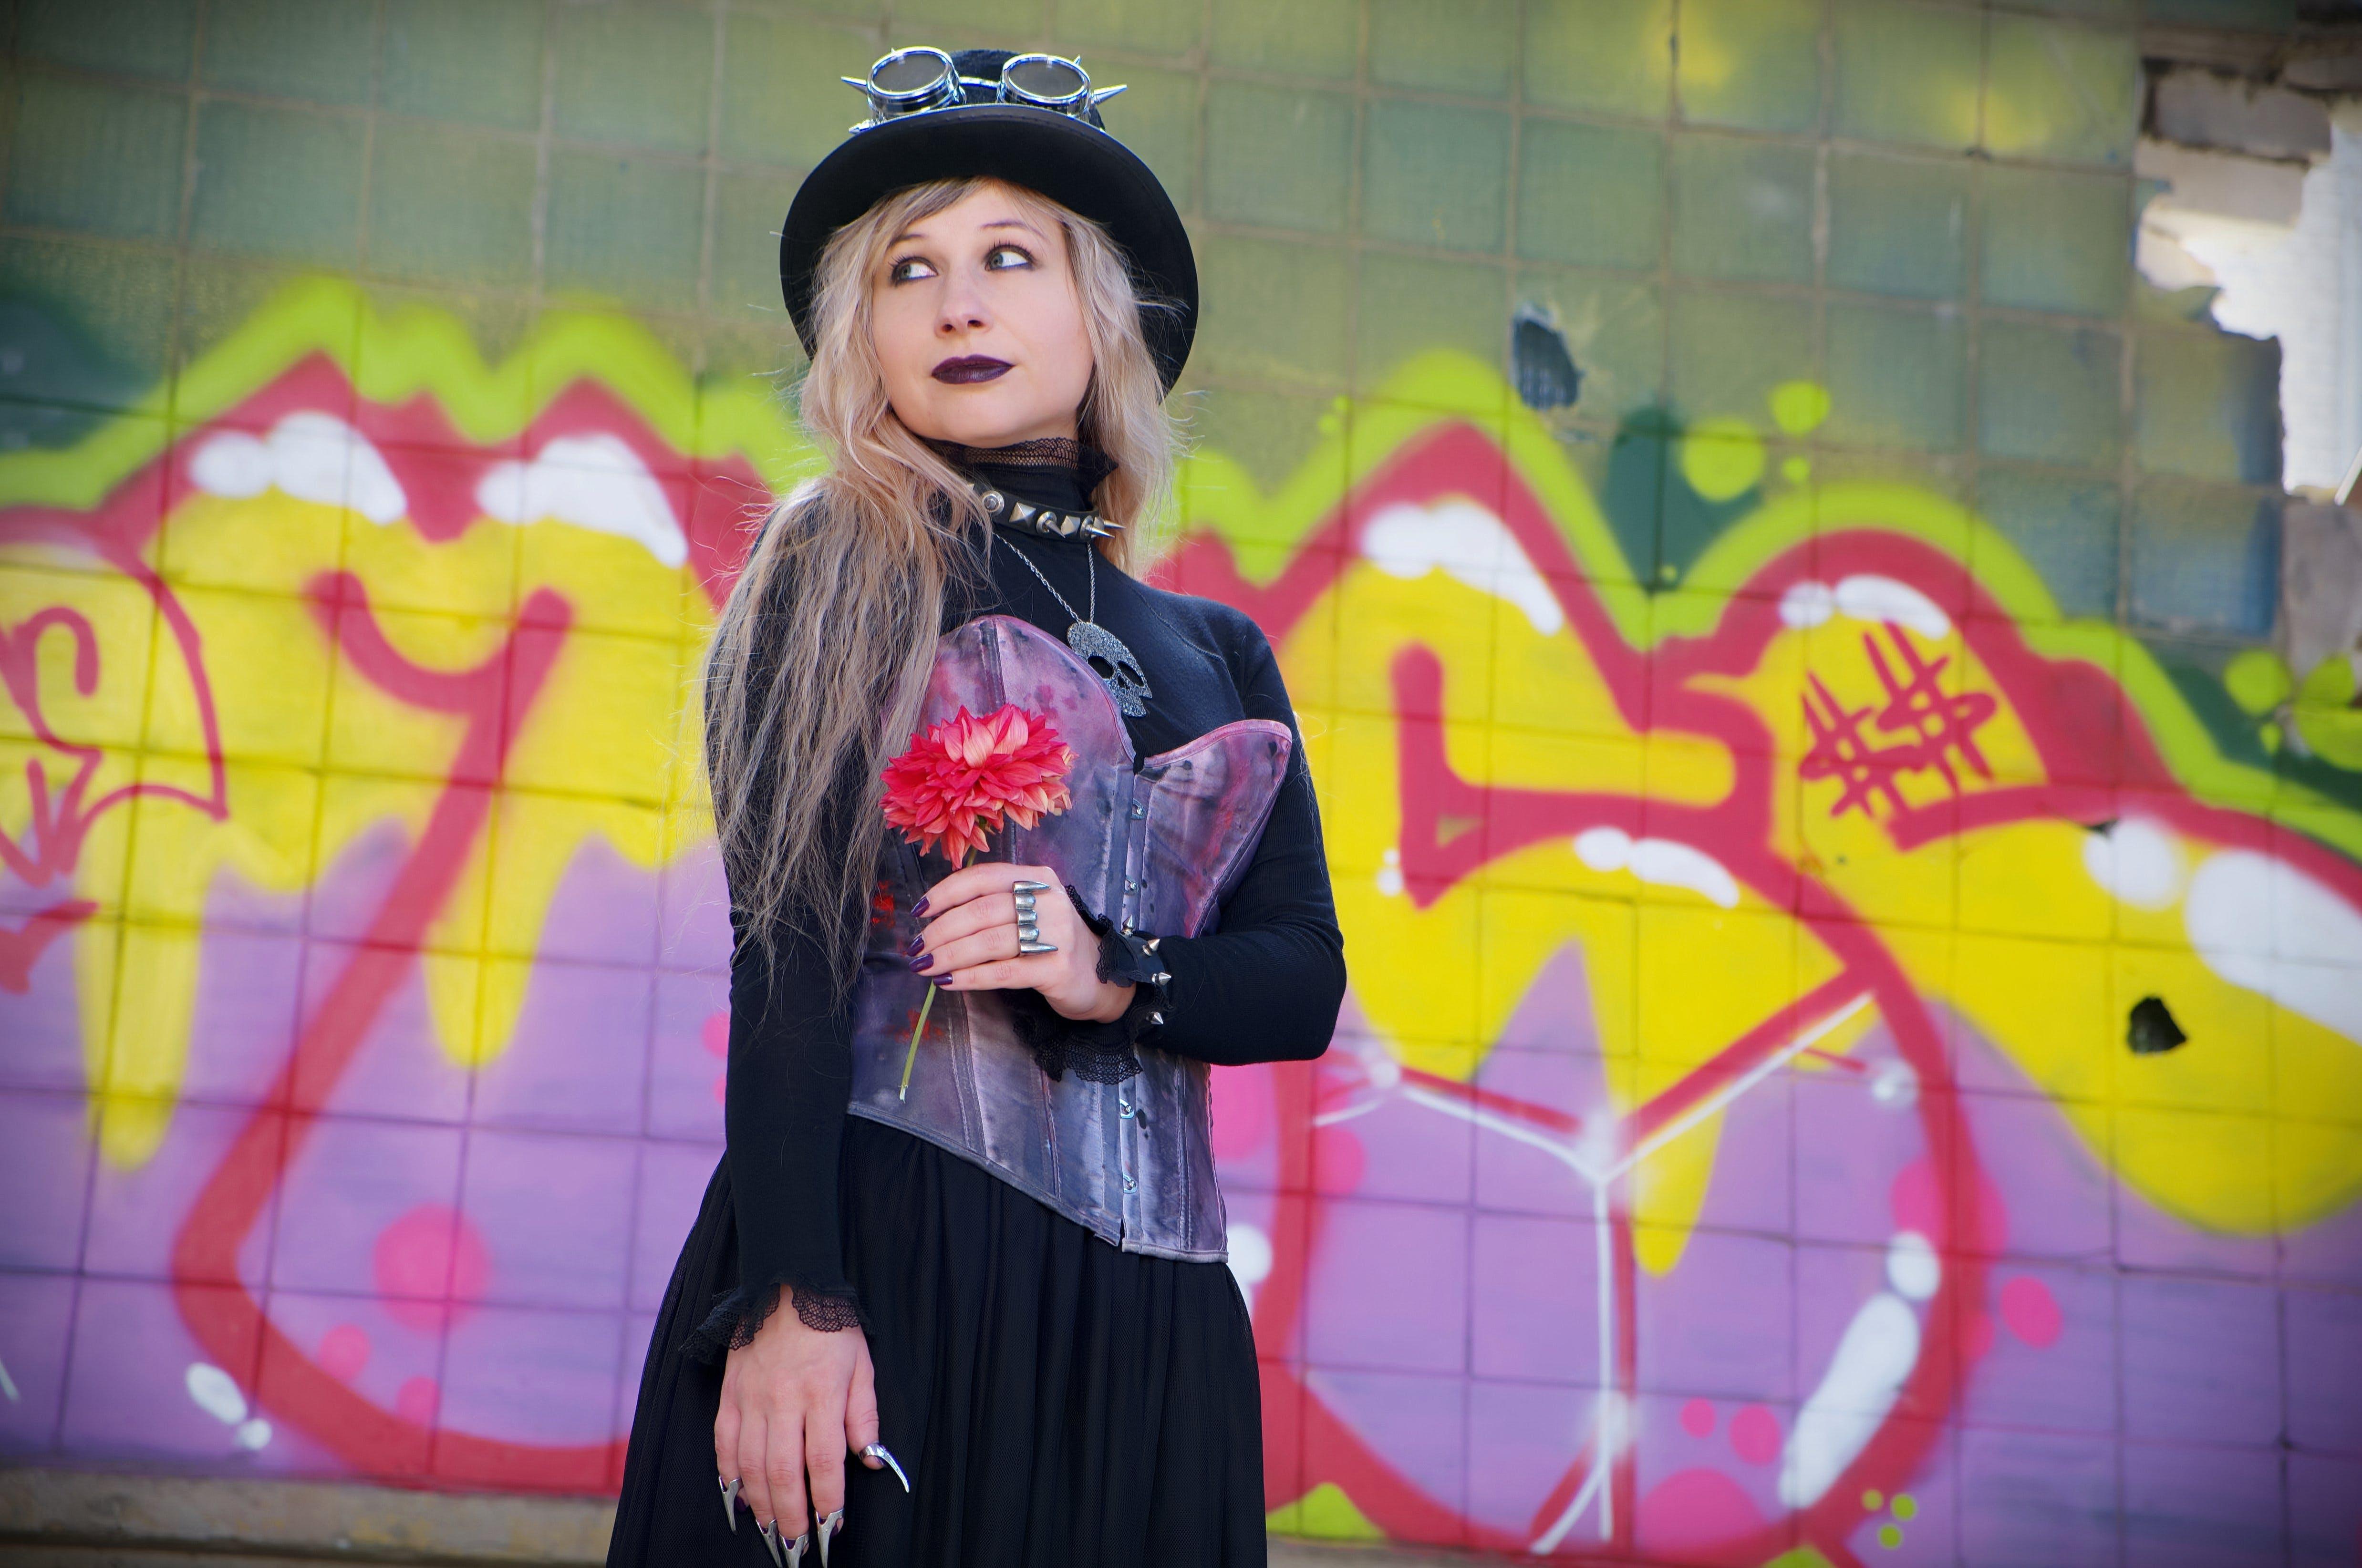 Photo of Woman Standing Near a Wall With Graffiti